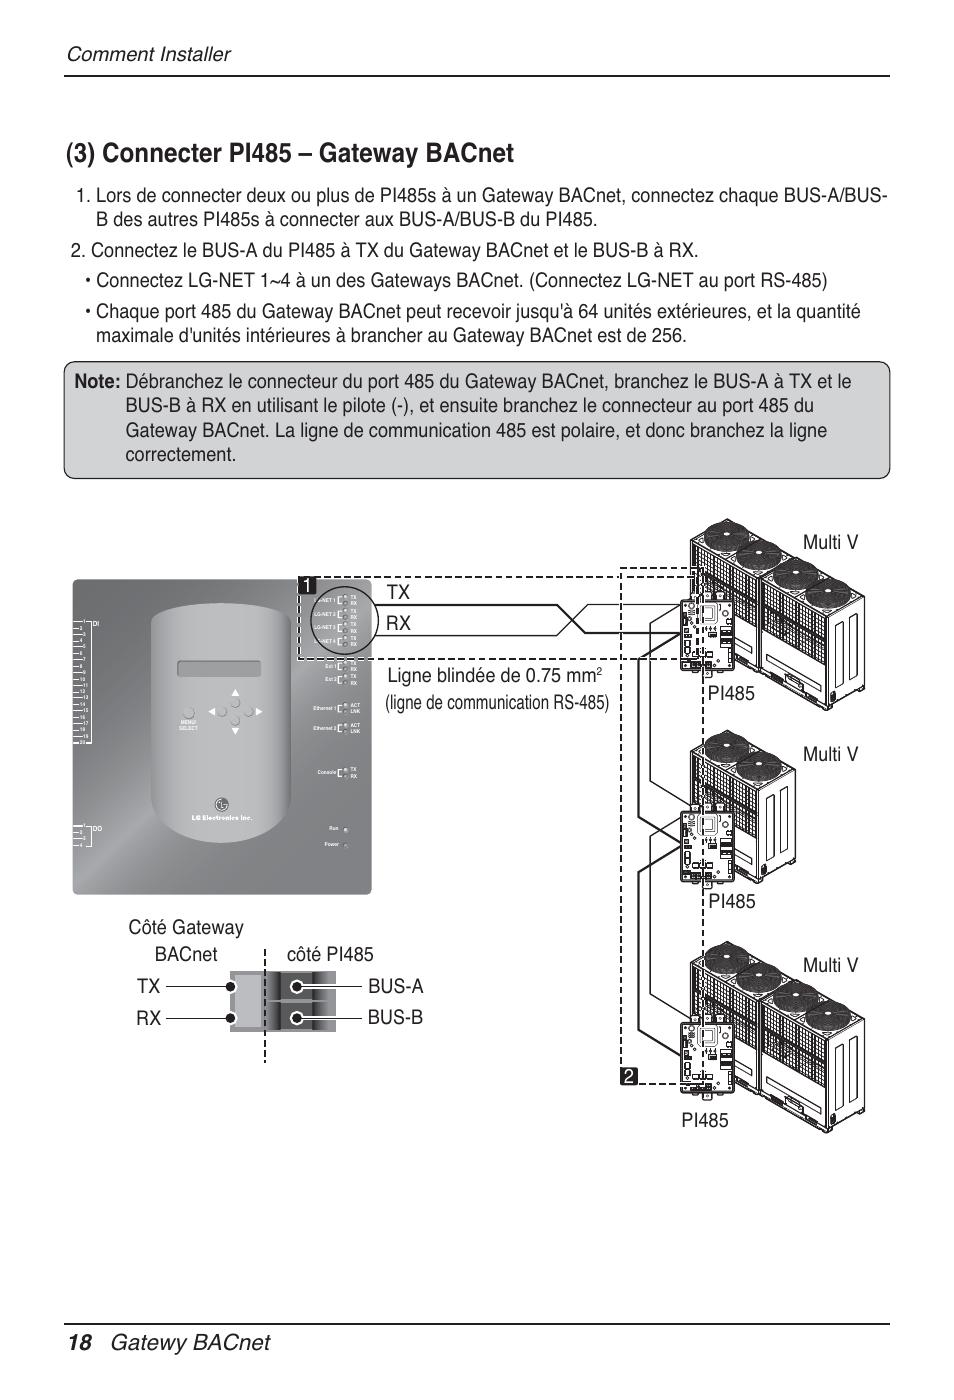 3) connecter pi485 – gateway bacnet, 18 gatewy bacnet